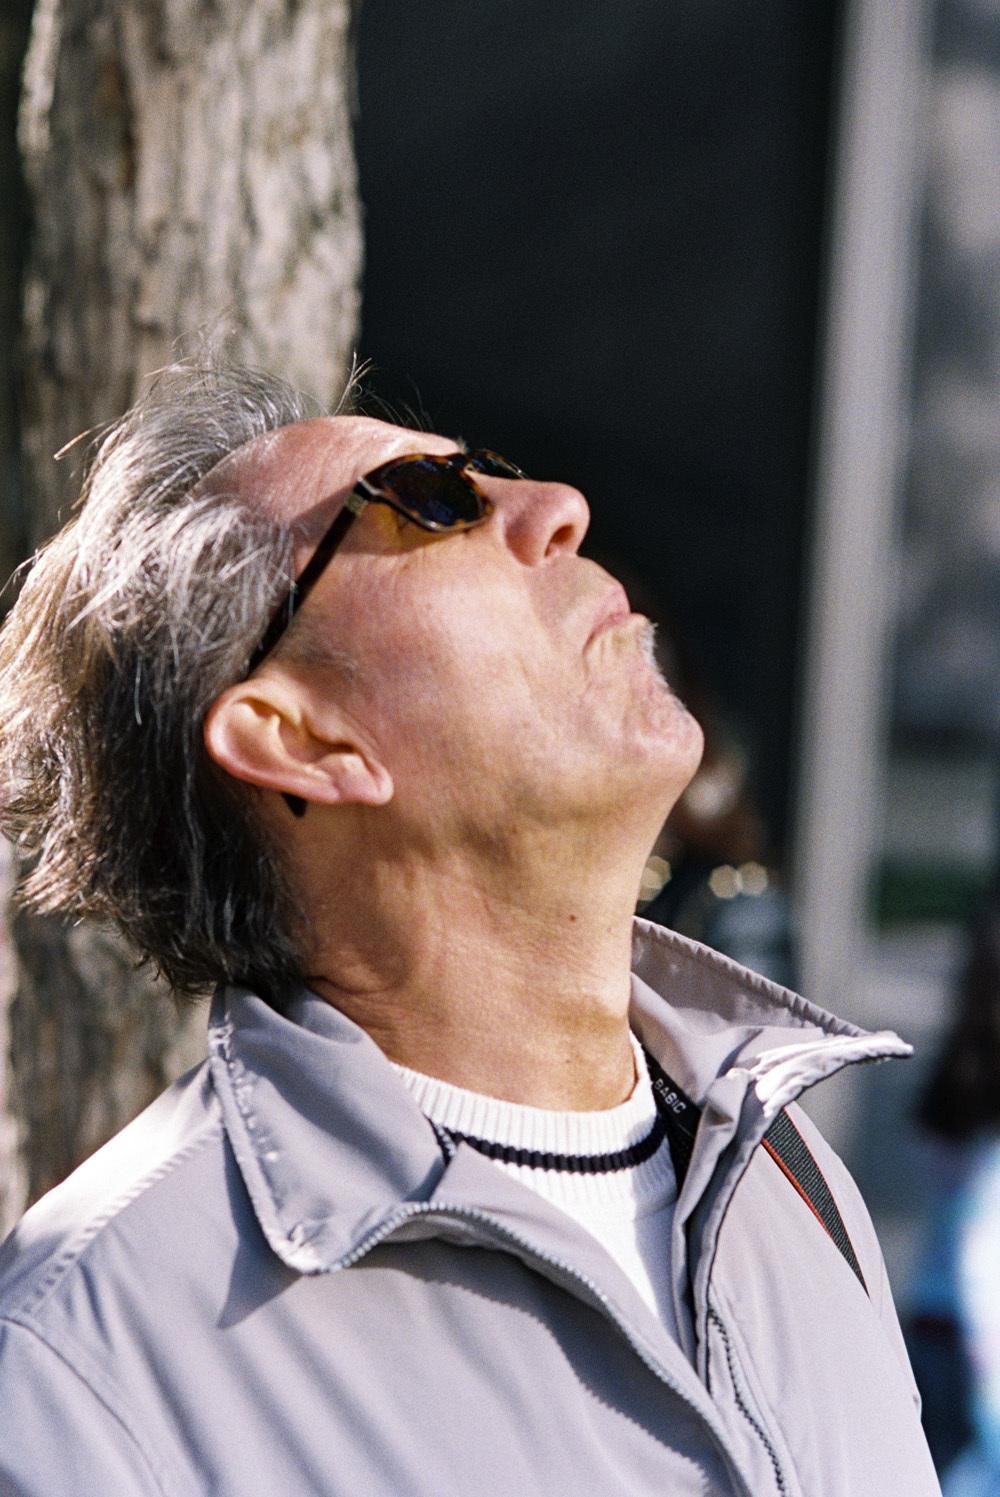 05_WTC17.jpg